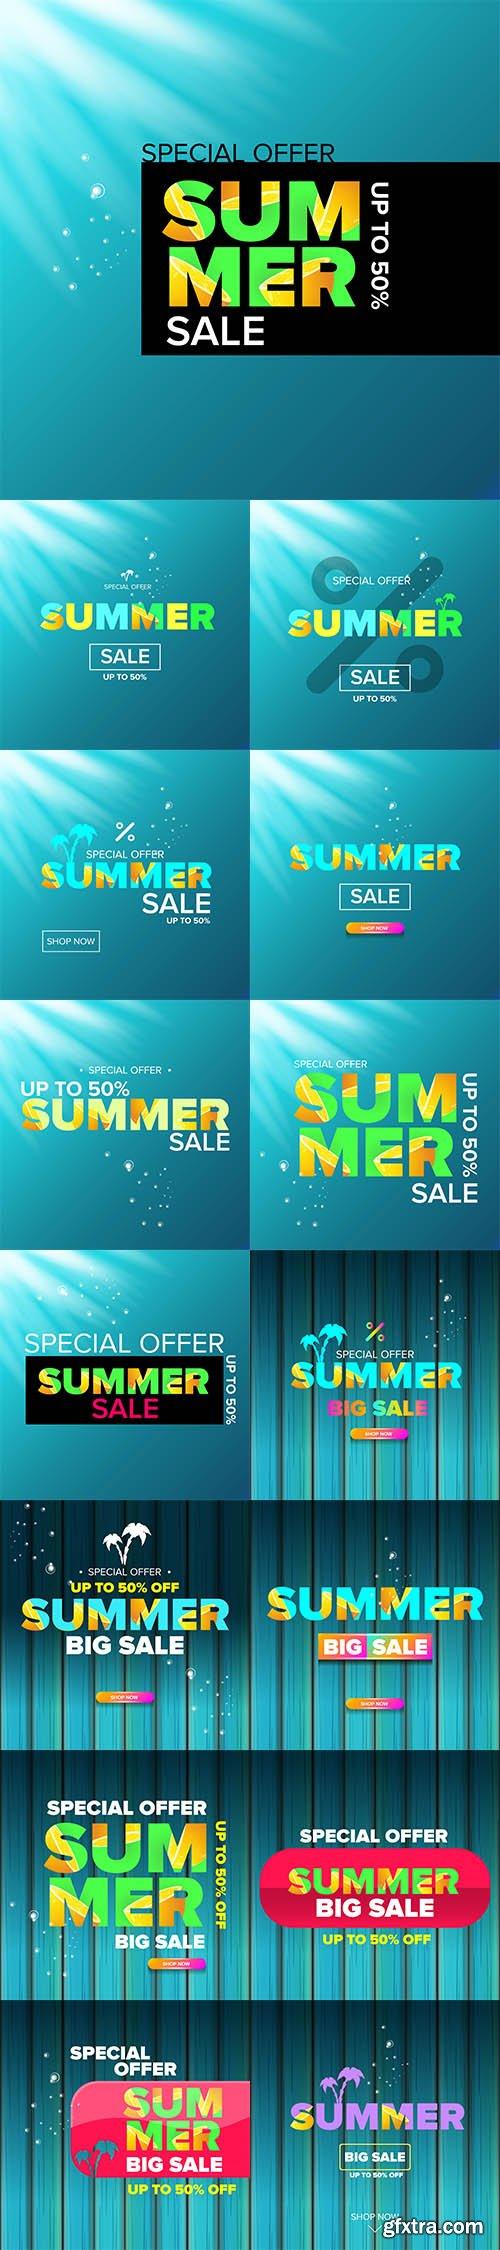 Vecto Set - Summer sale modern color design template web banner or poster